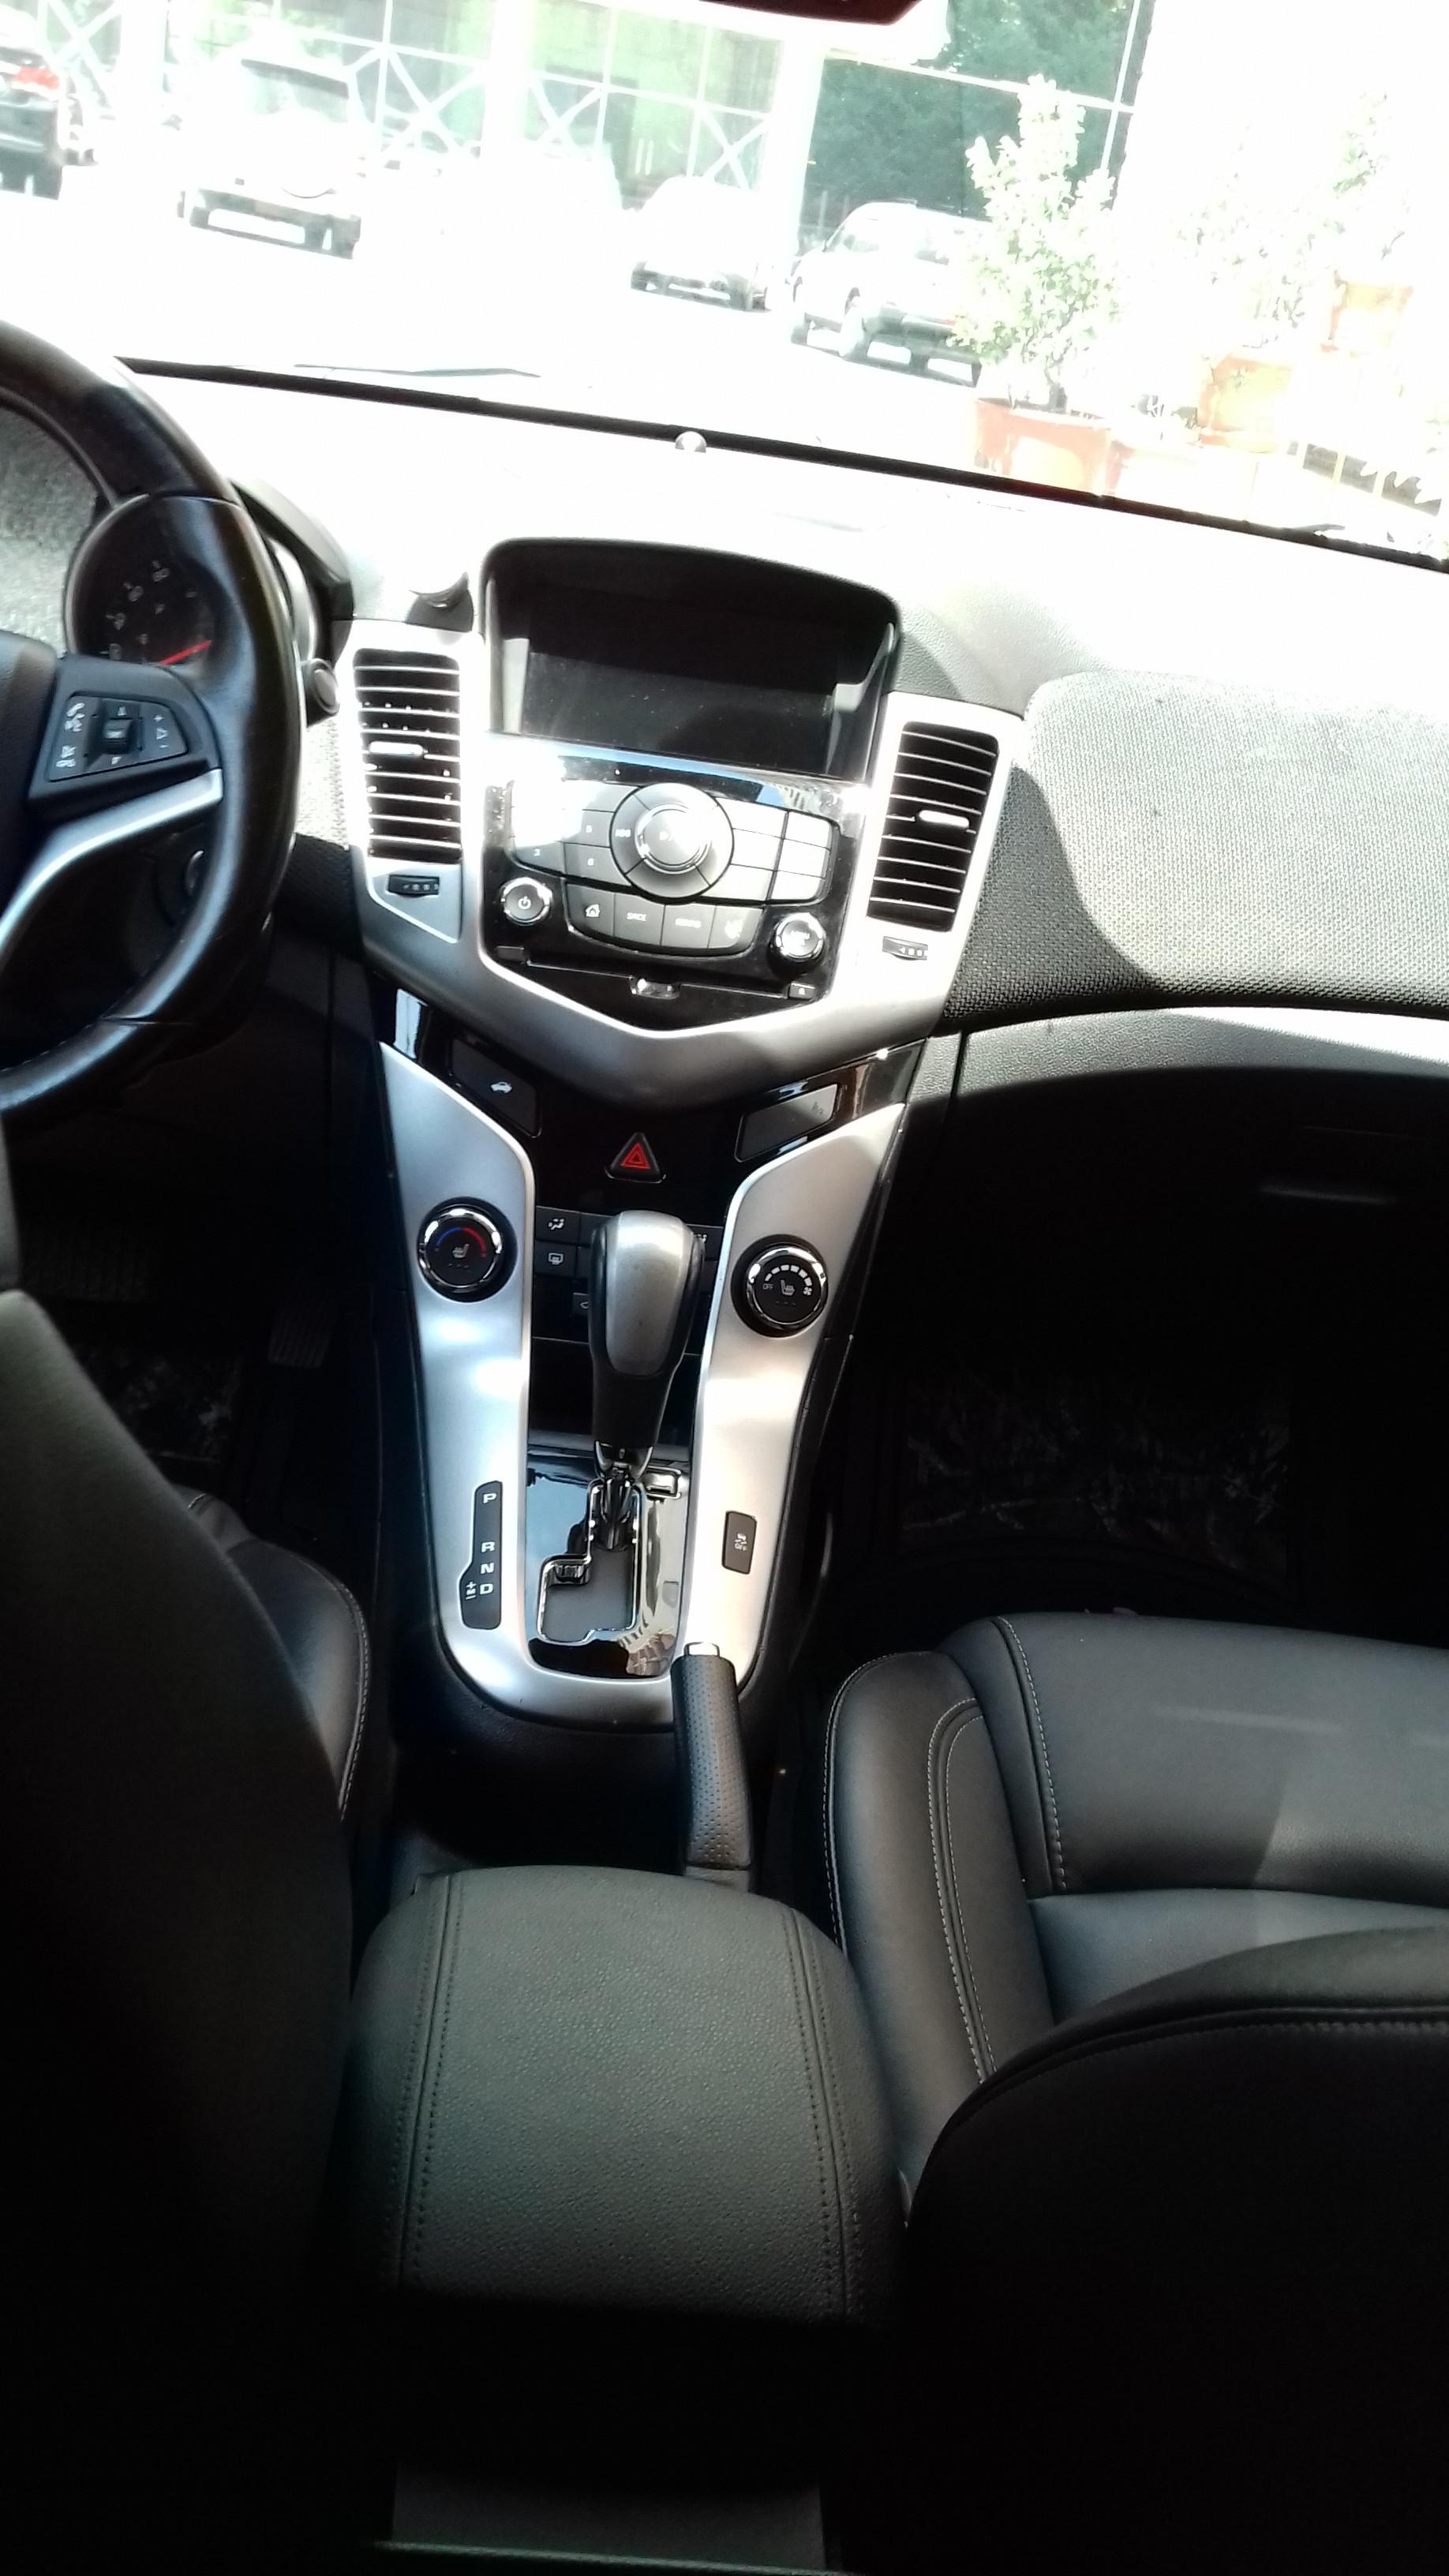 Chevrolet Cruze 1.4(lt) 2014 İkinci əl  $9200